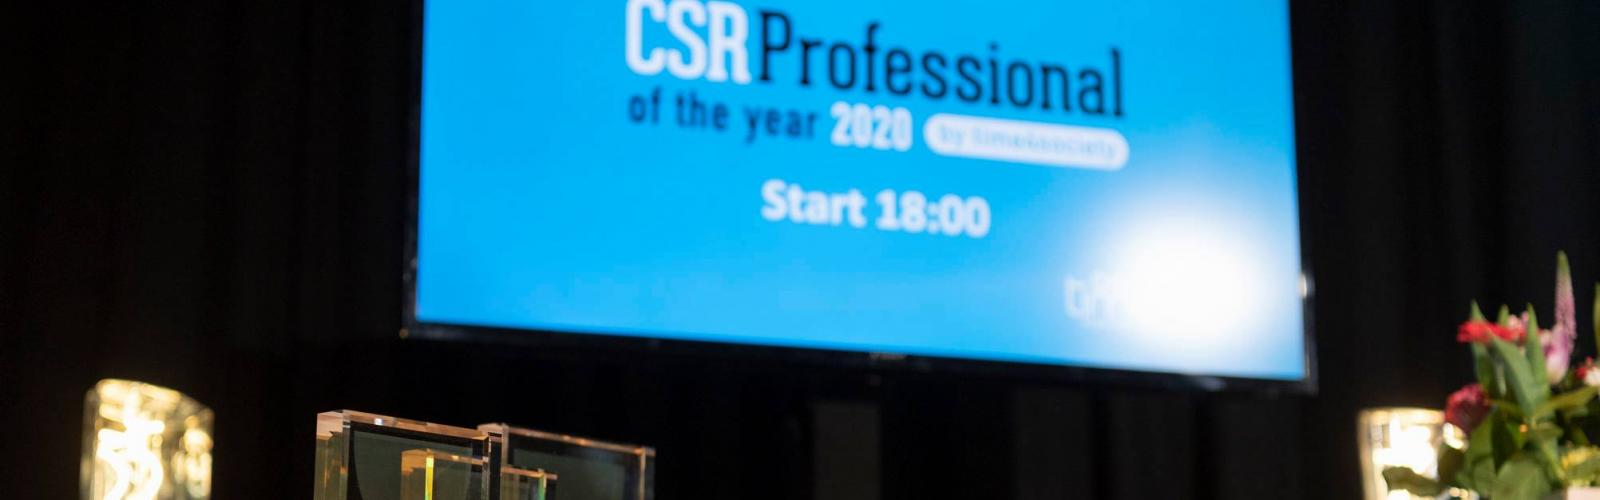 startbeeld CSR Professional of the Year